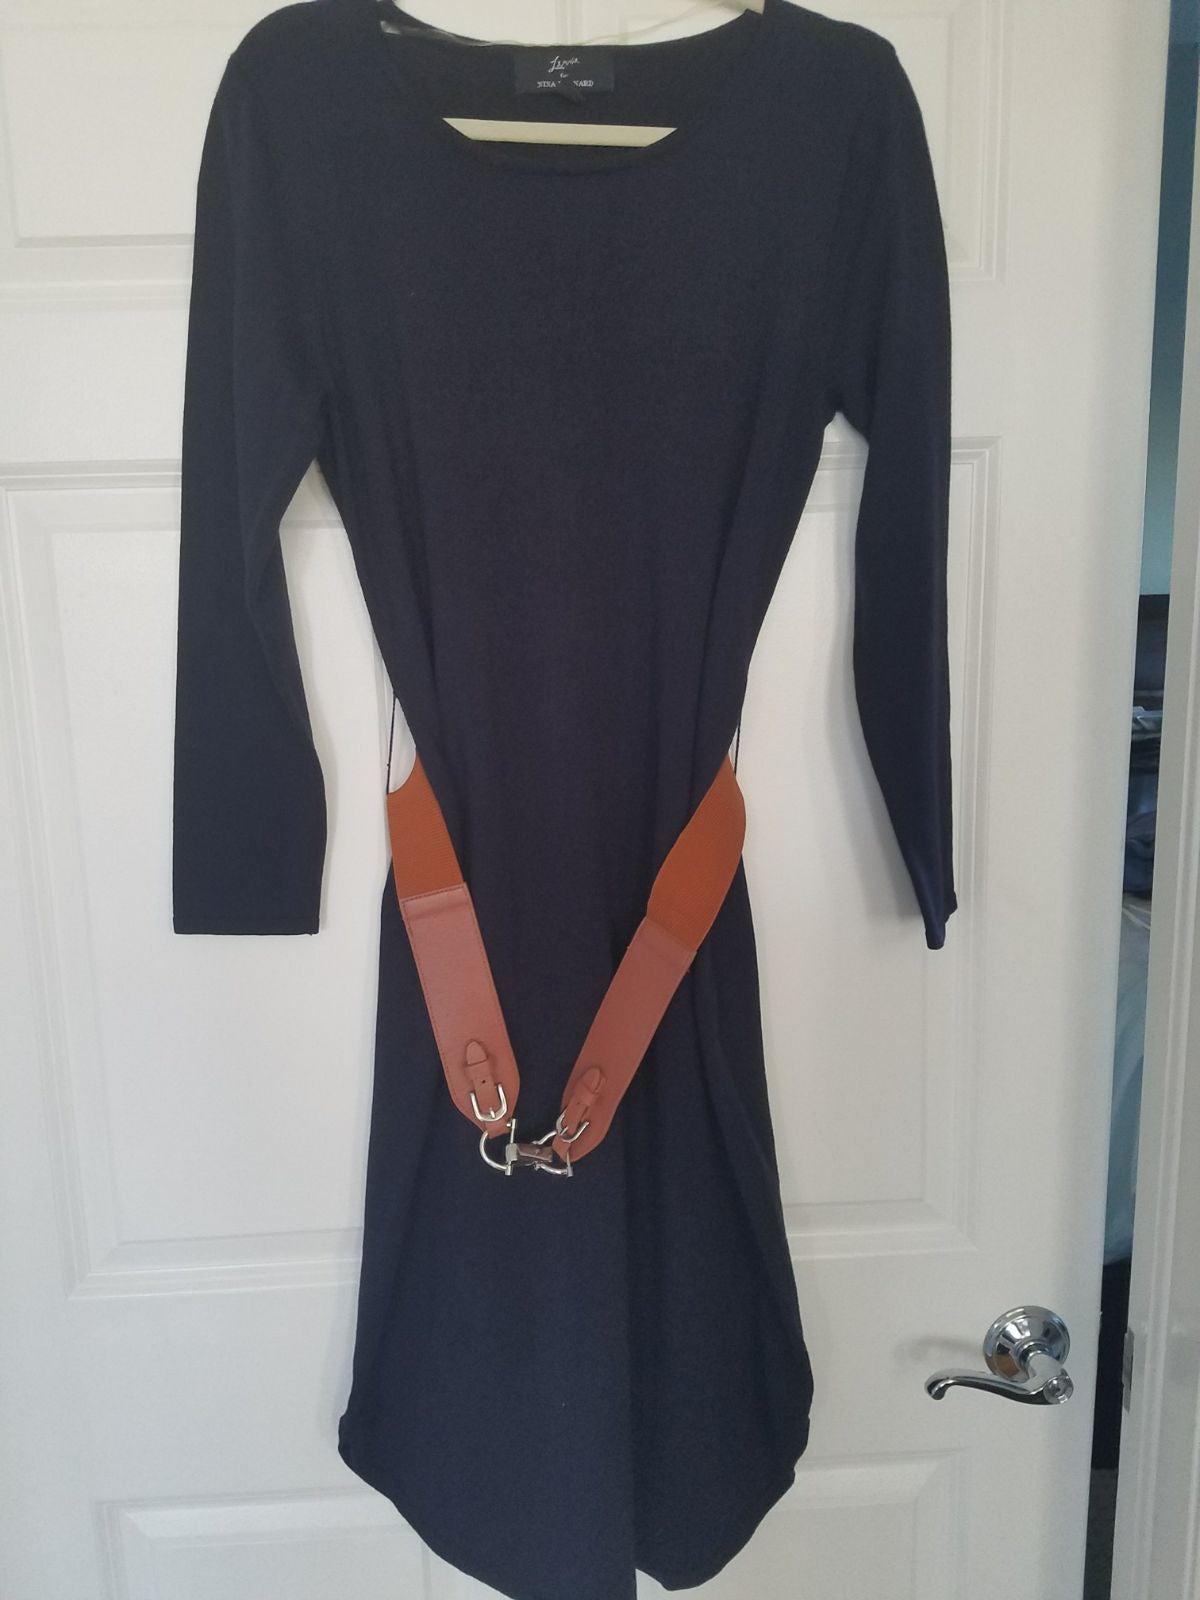 Sweater Dress, Nina Leonard label. Navy